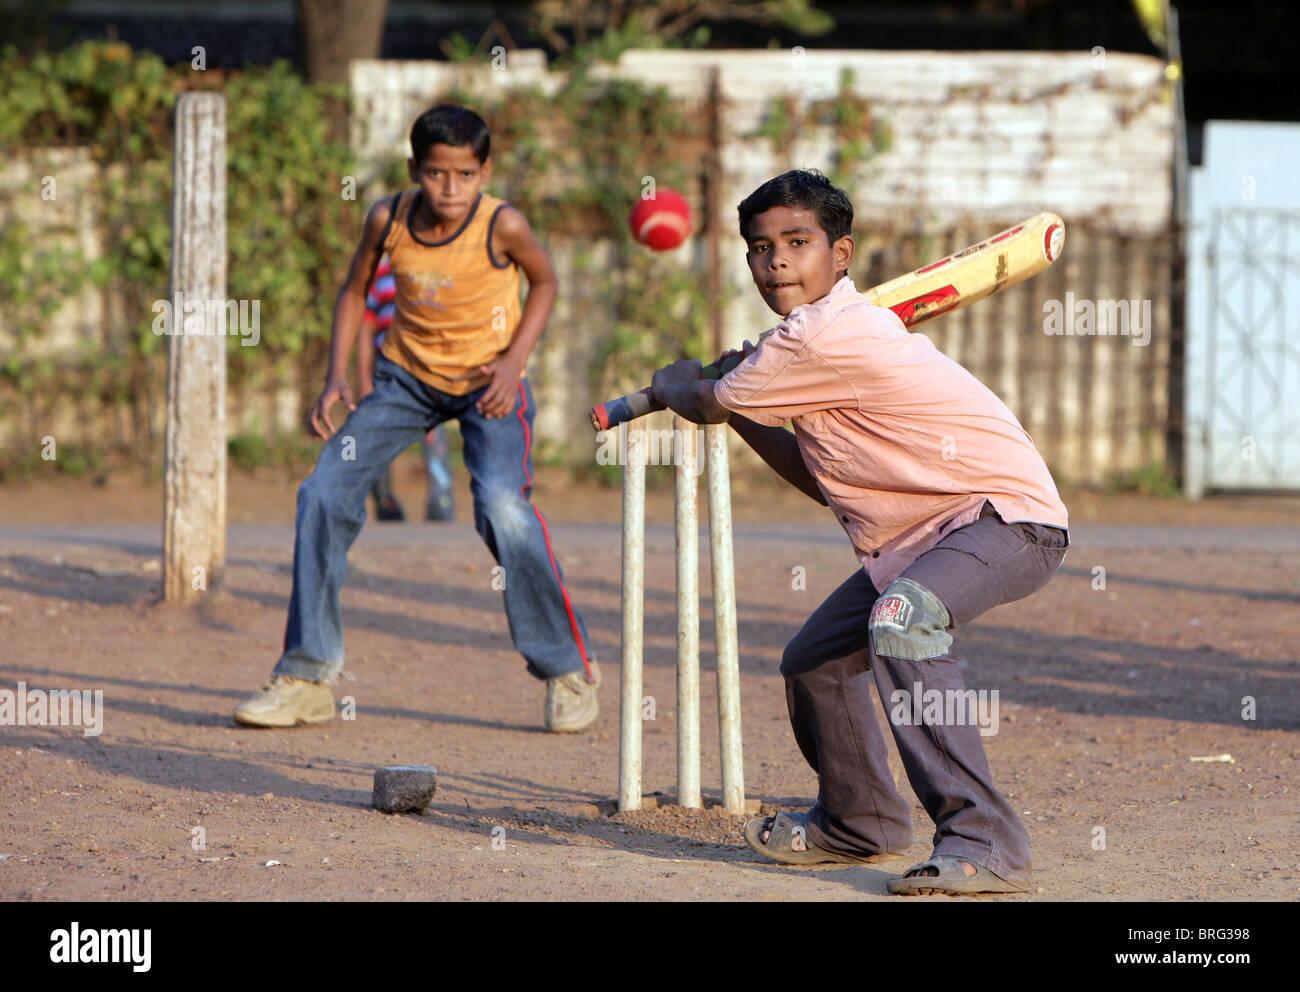 Les garçons à jouer au cricket à Katni, état du Madhya Pradesh, Inde Photo Stock